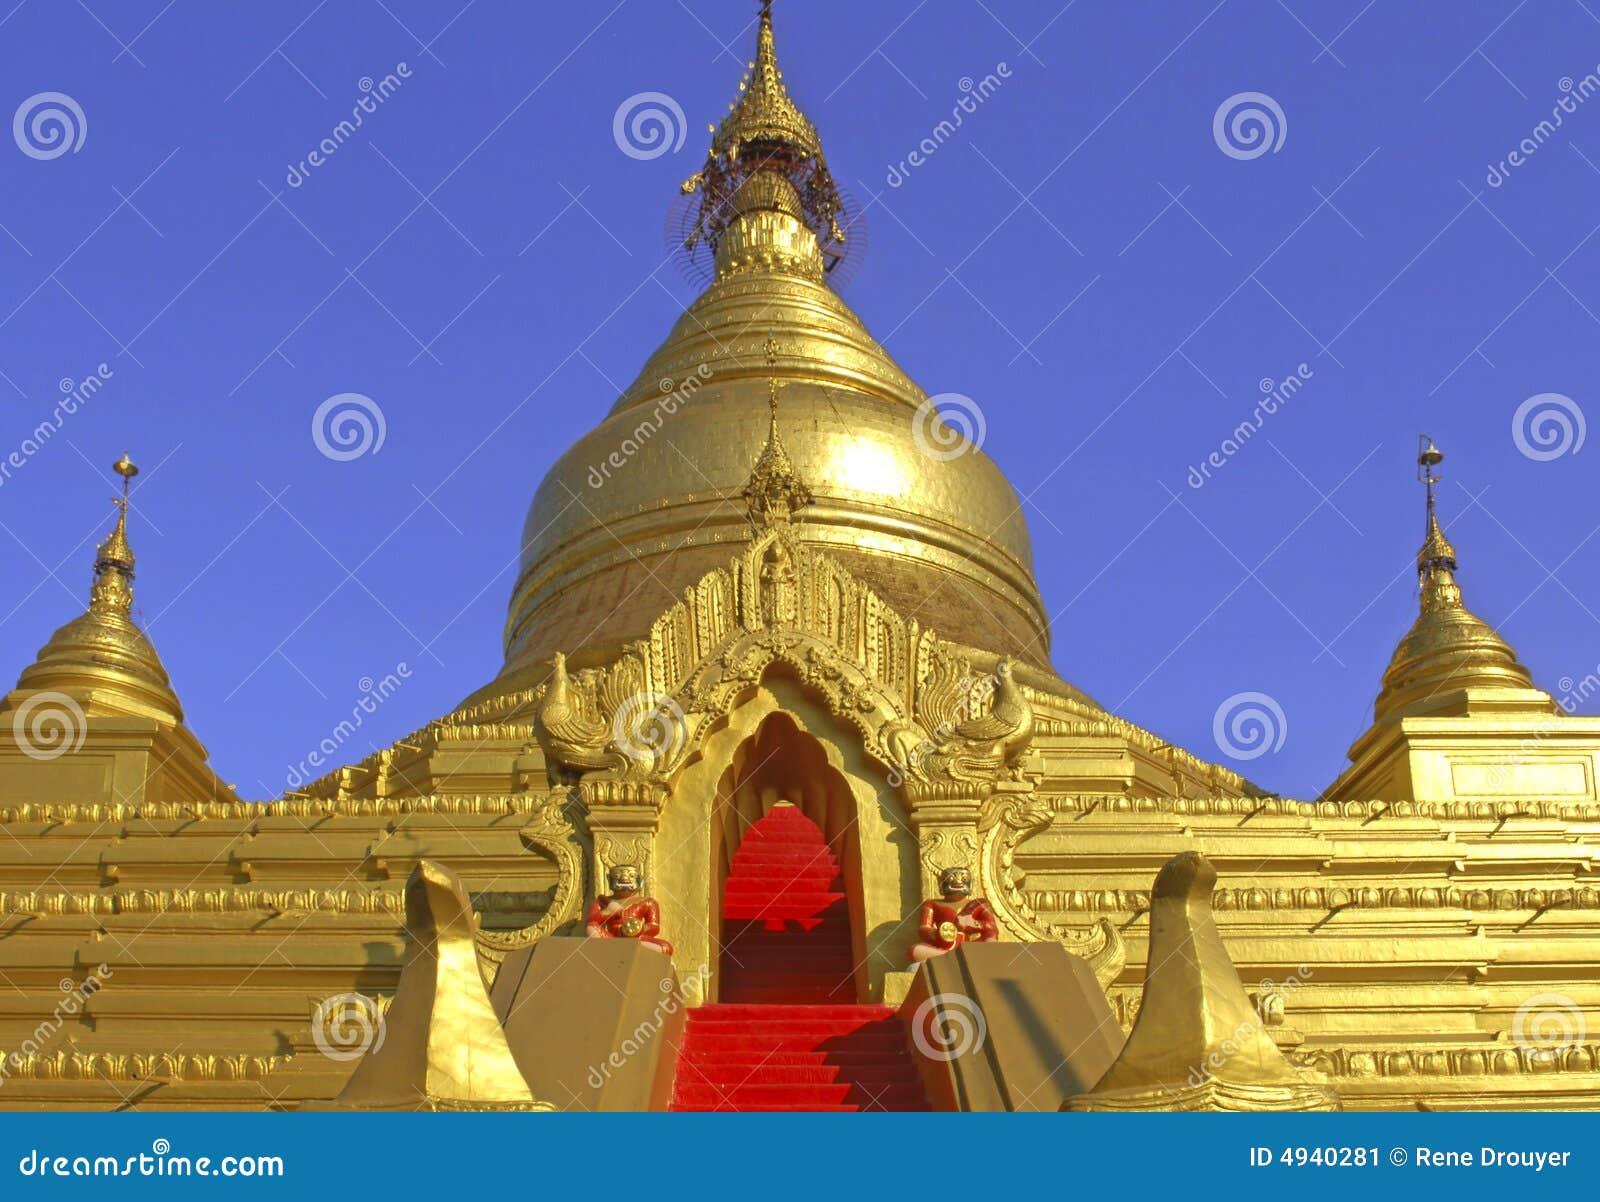 Pagoda mandalay myanmar